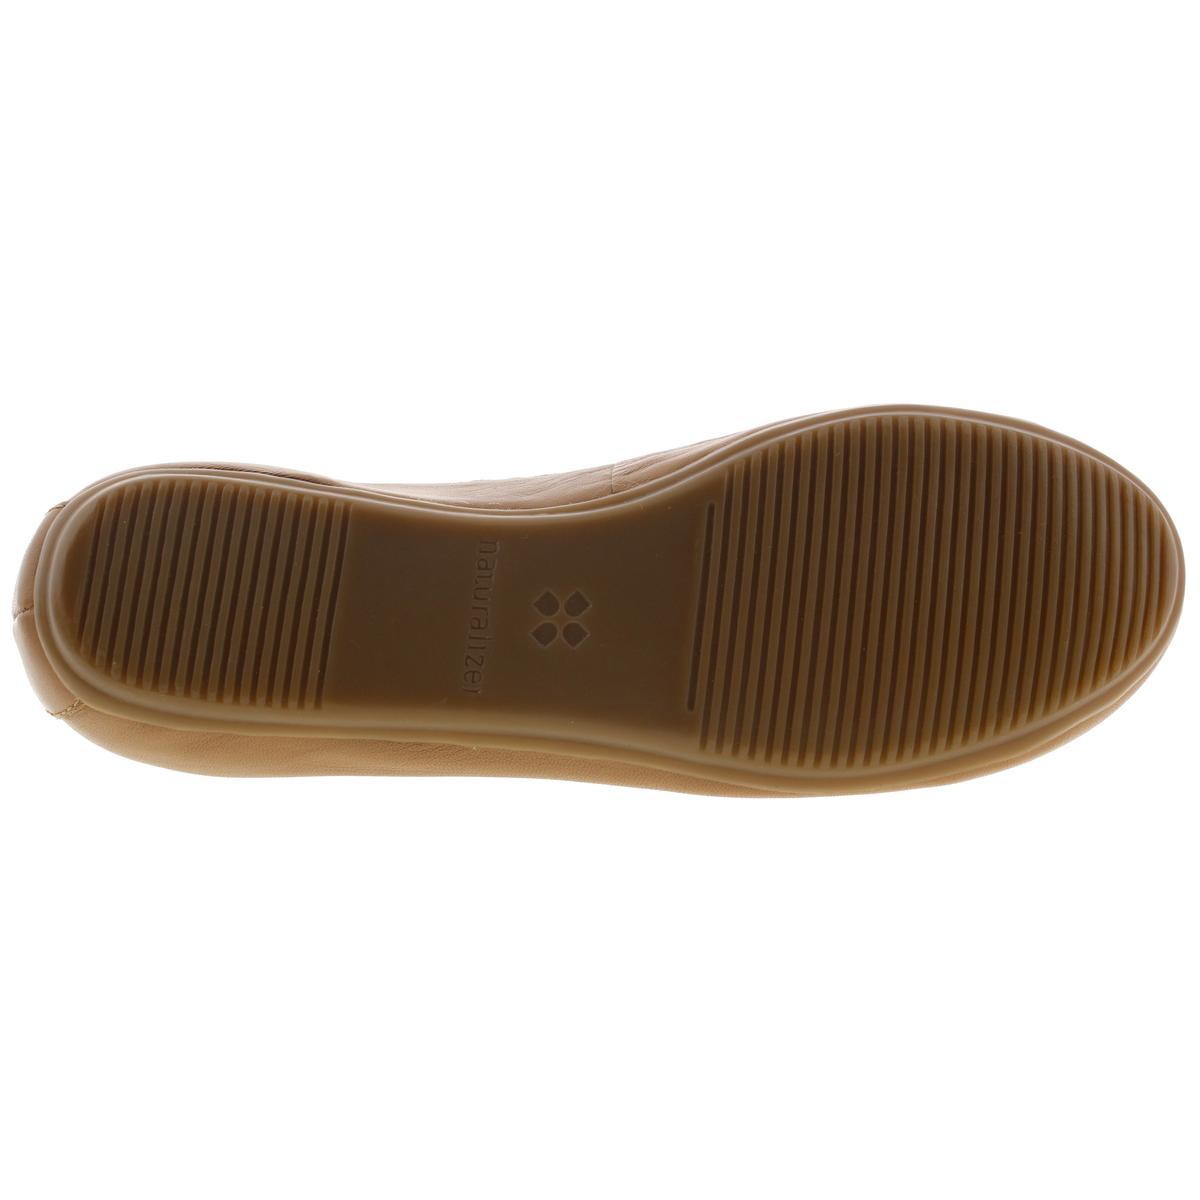 Naturalizer Damenschuhe Brittany Leder Schuhes Slide On Ballet Flats Schuhes Leder BHFO 3677 65e9e5